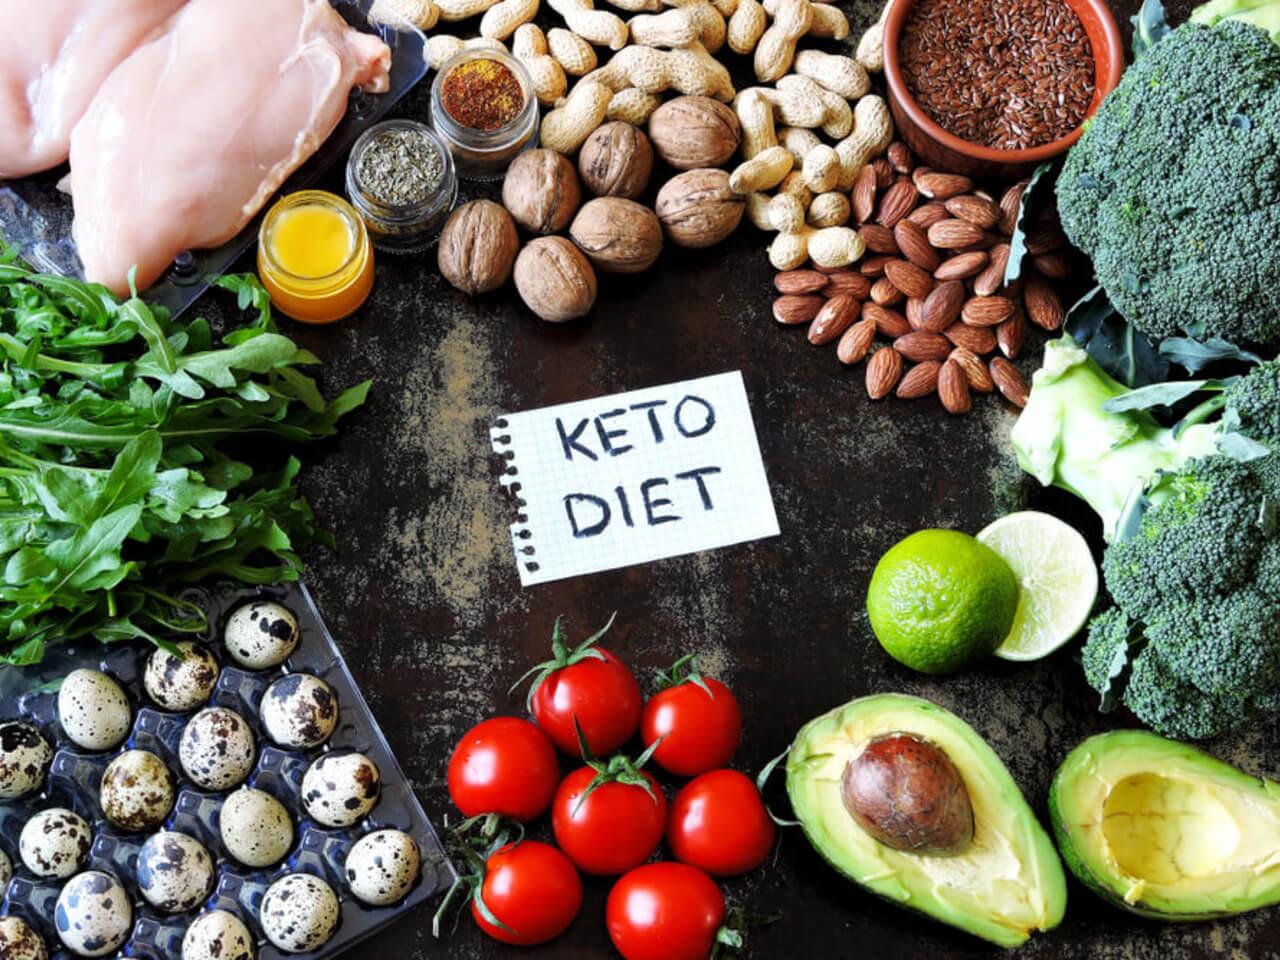 Nízkosacharidová dieta. Zbaví přebytečných kil a závislosti na sladkém?